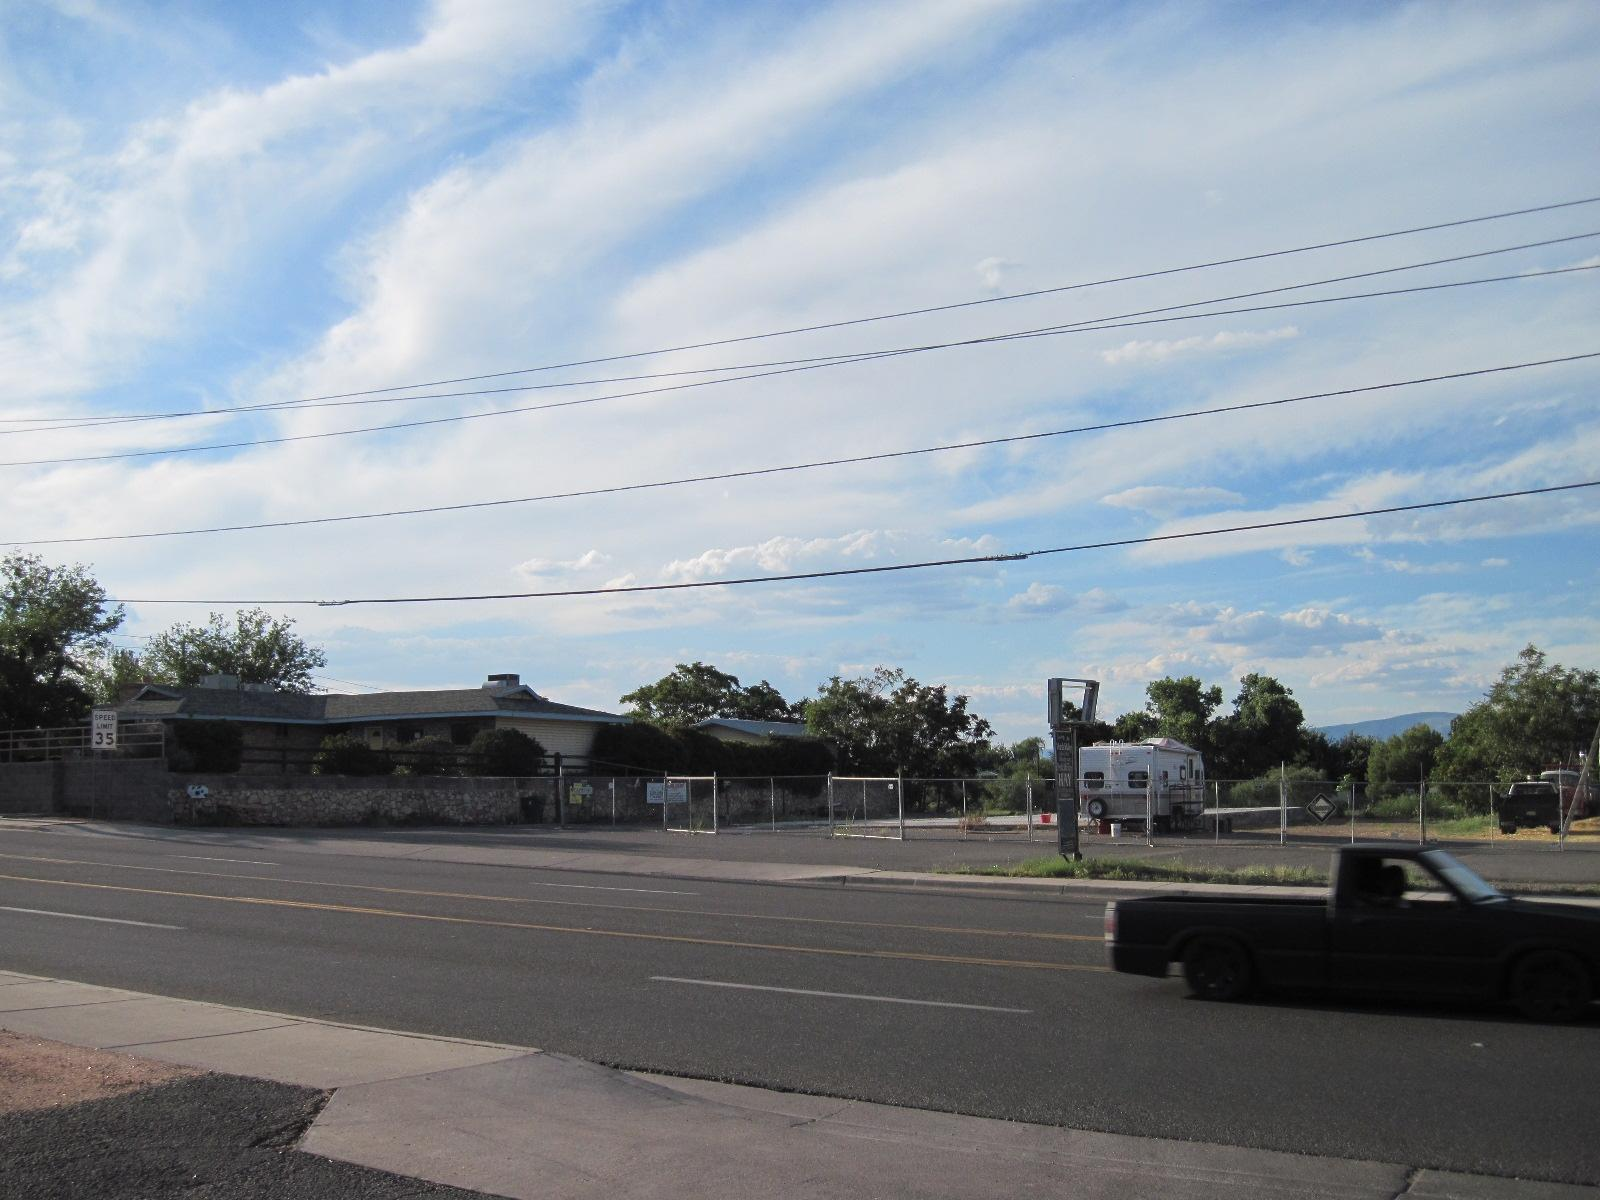 2410 E 89a Cottonwood, AZ 86326